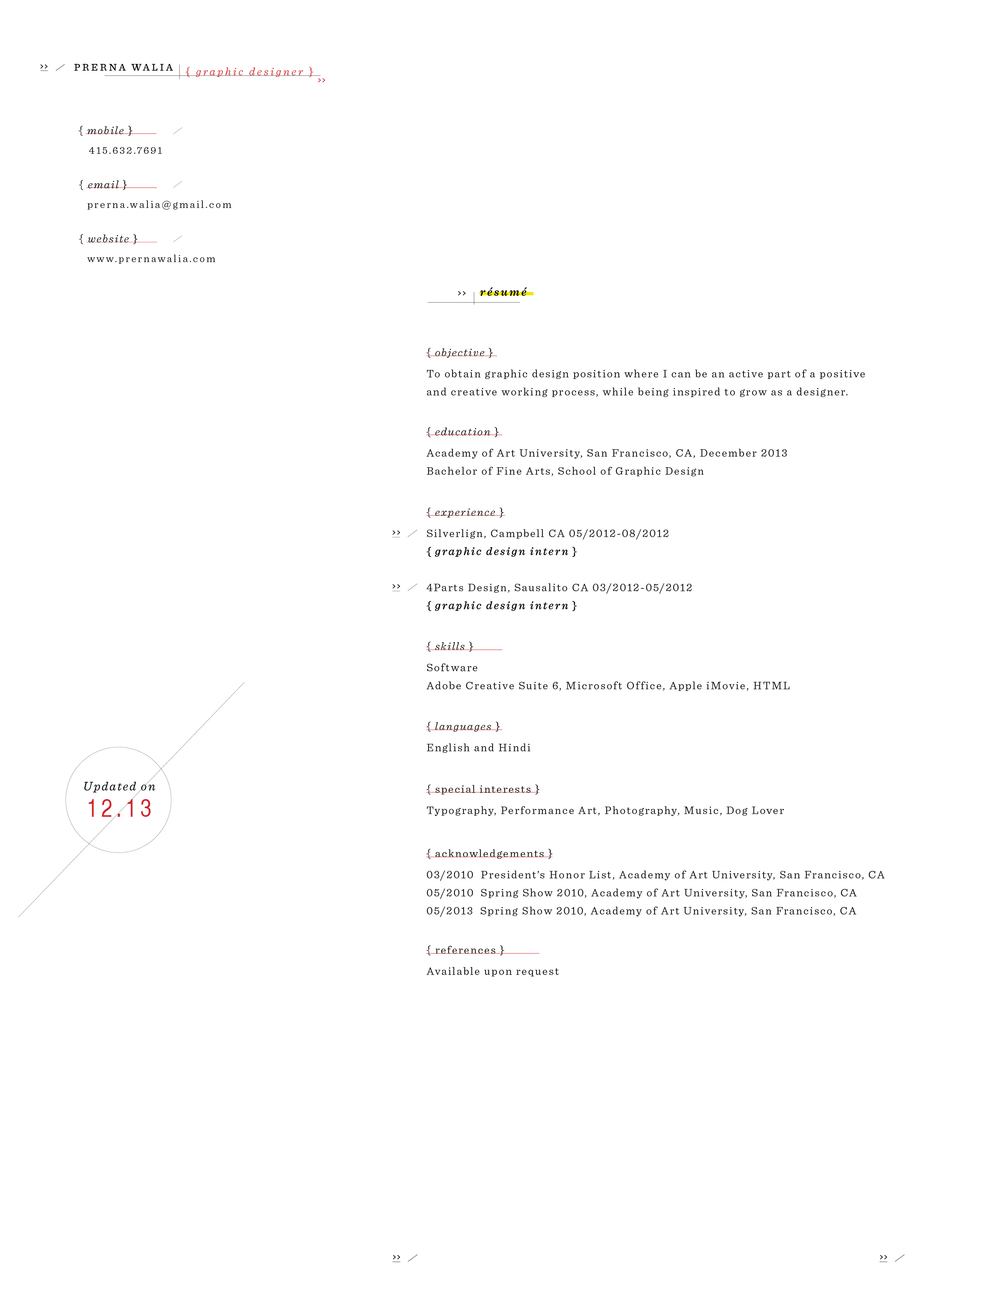 PrernaWalia_Resume.jpg